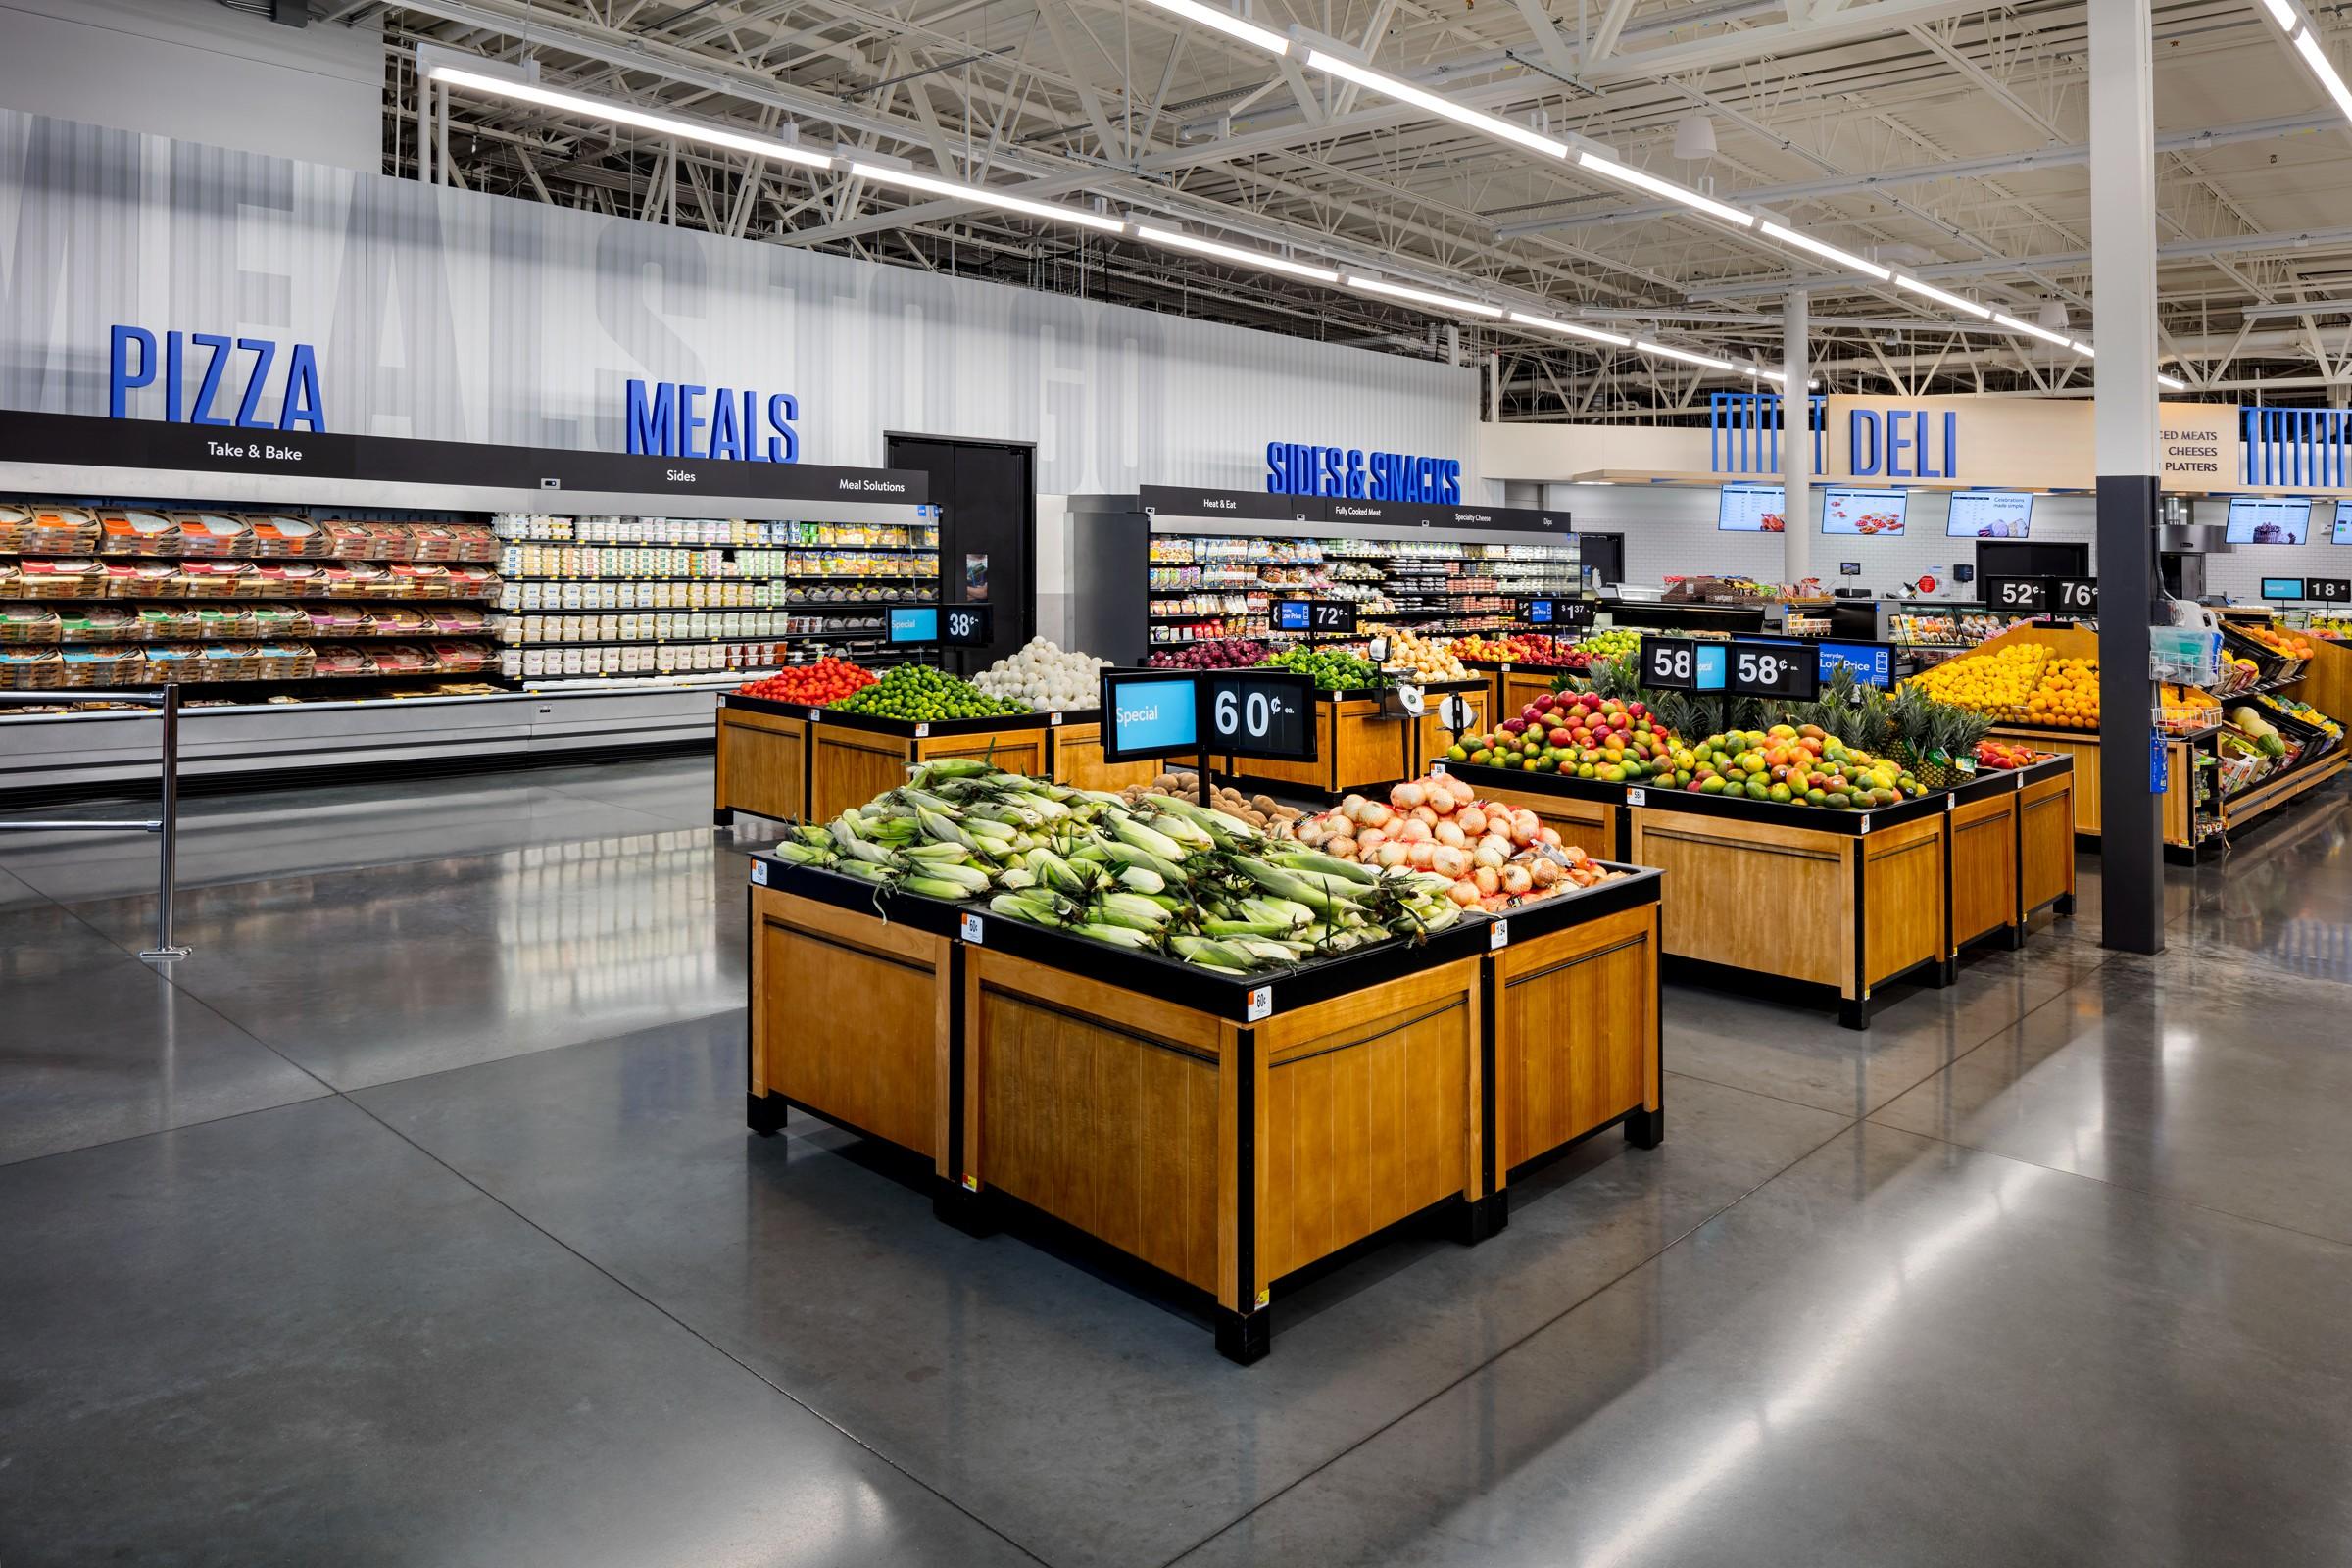 Walmart store update 2020 - produce